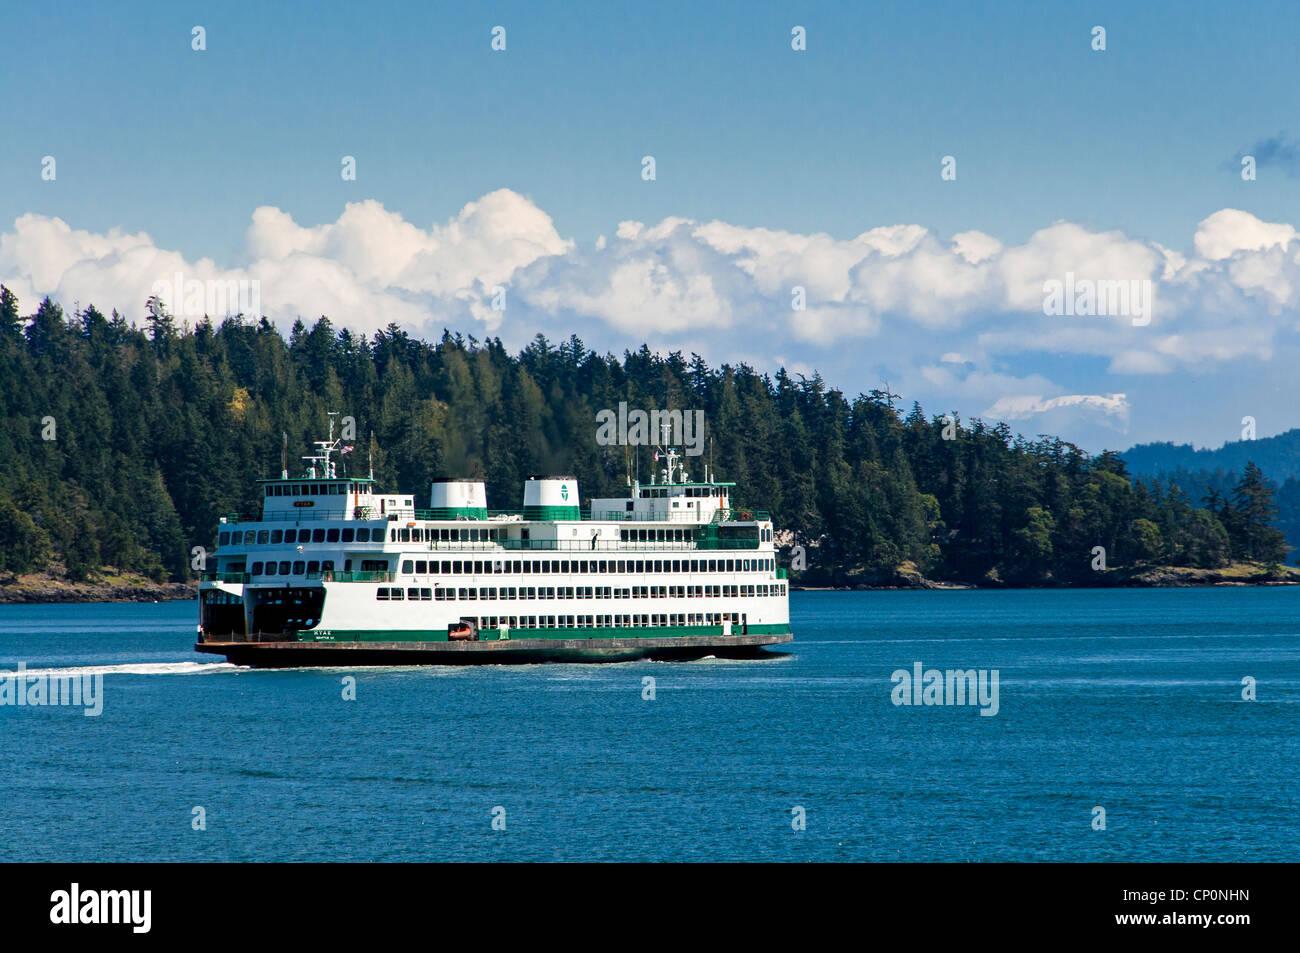 Washington State Ferry 'Hyak' leaving Shaw Island, San Juan Islands, Washington. - Stock Image